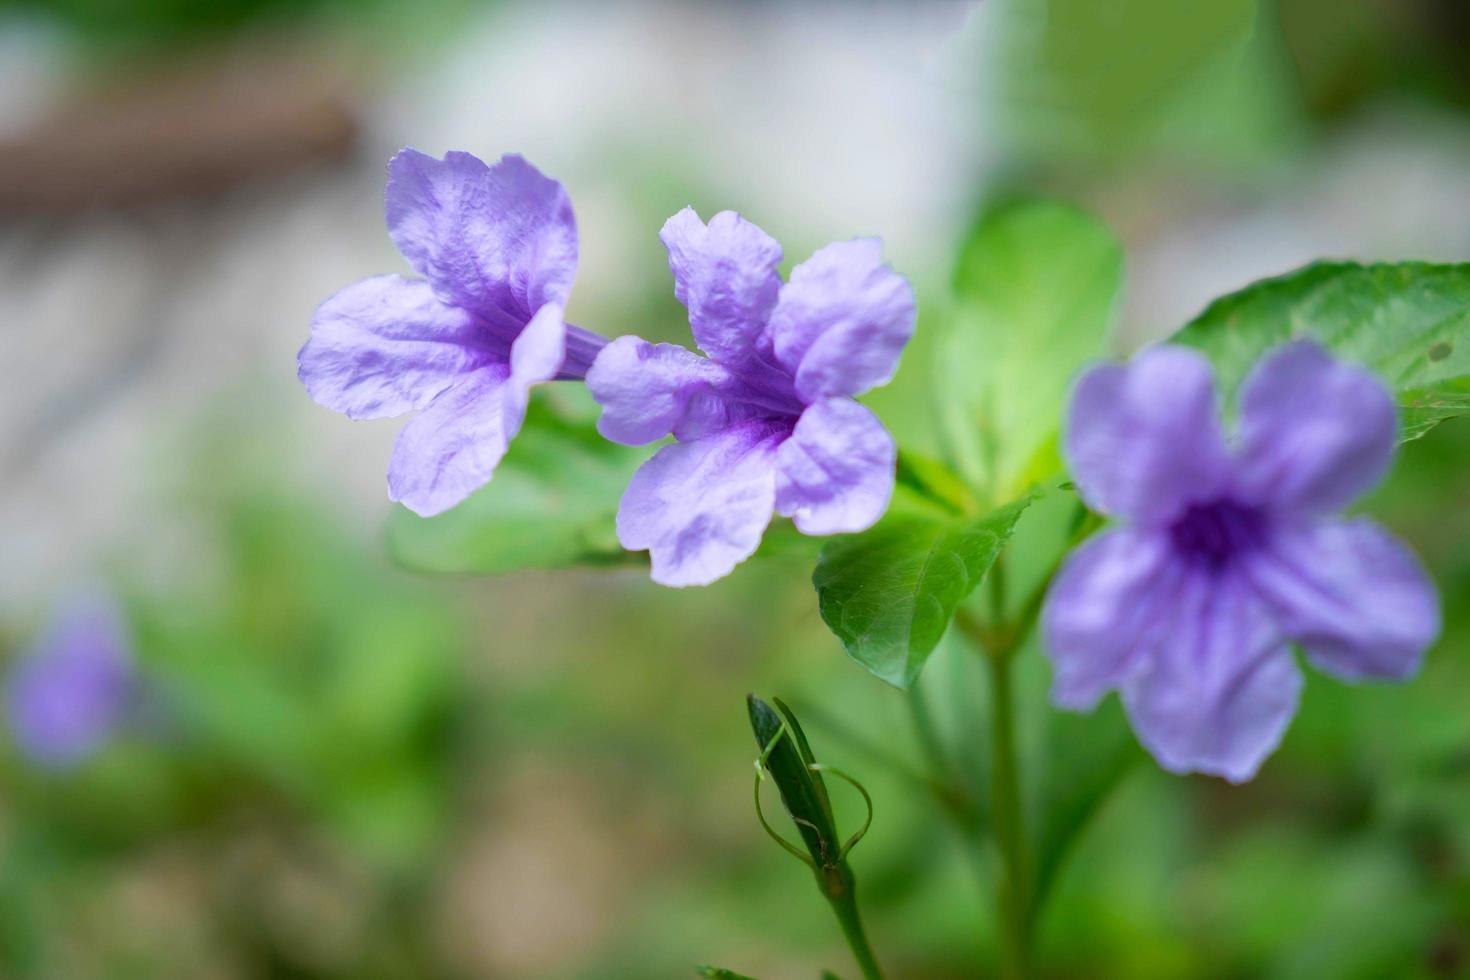 ruellia tuberosa flor antecedentes foto